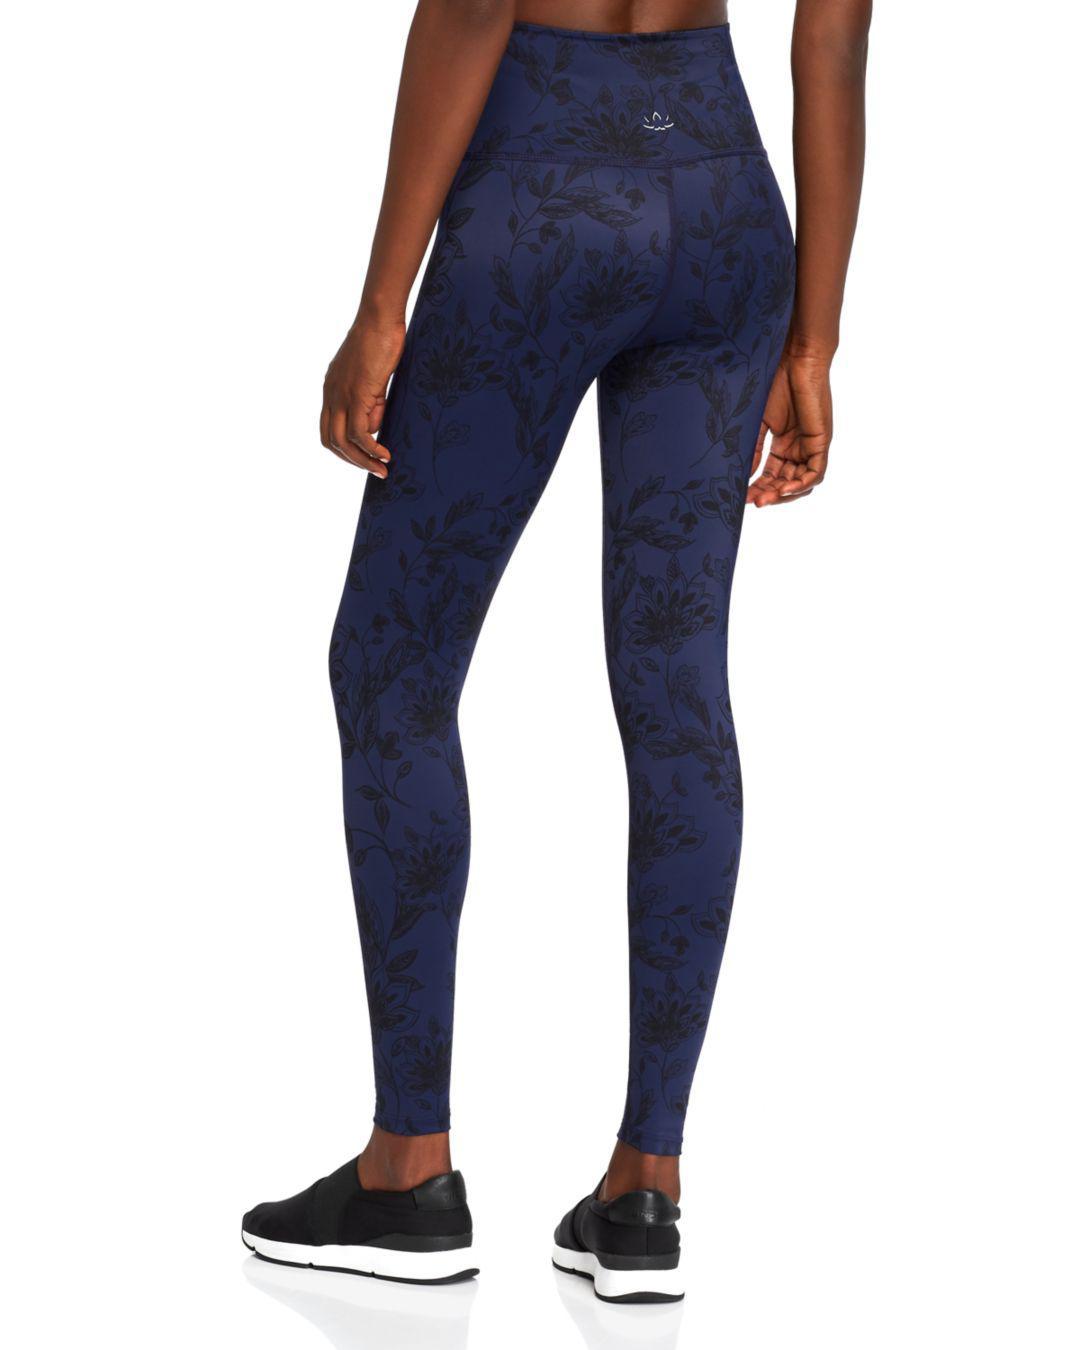 76f452d557 Beyond Yoga High-waisted Floral Print Leggings in Blue - Lyst